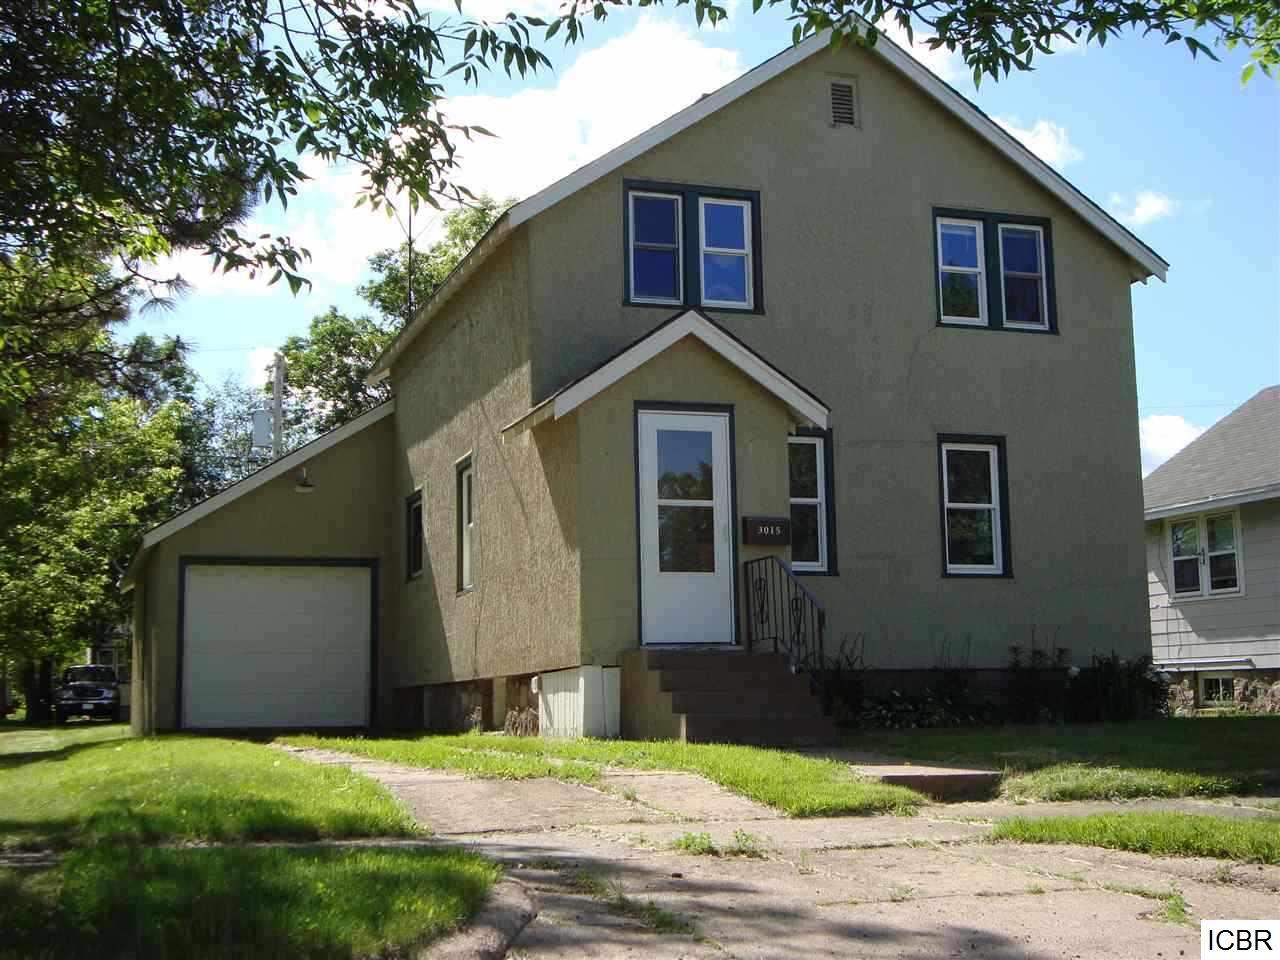 Real Estate for Sale, ListingId: 35675387, Hibbing,MN55746